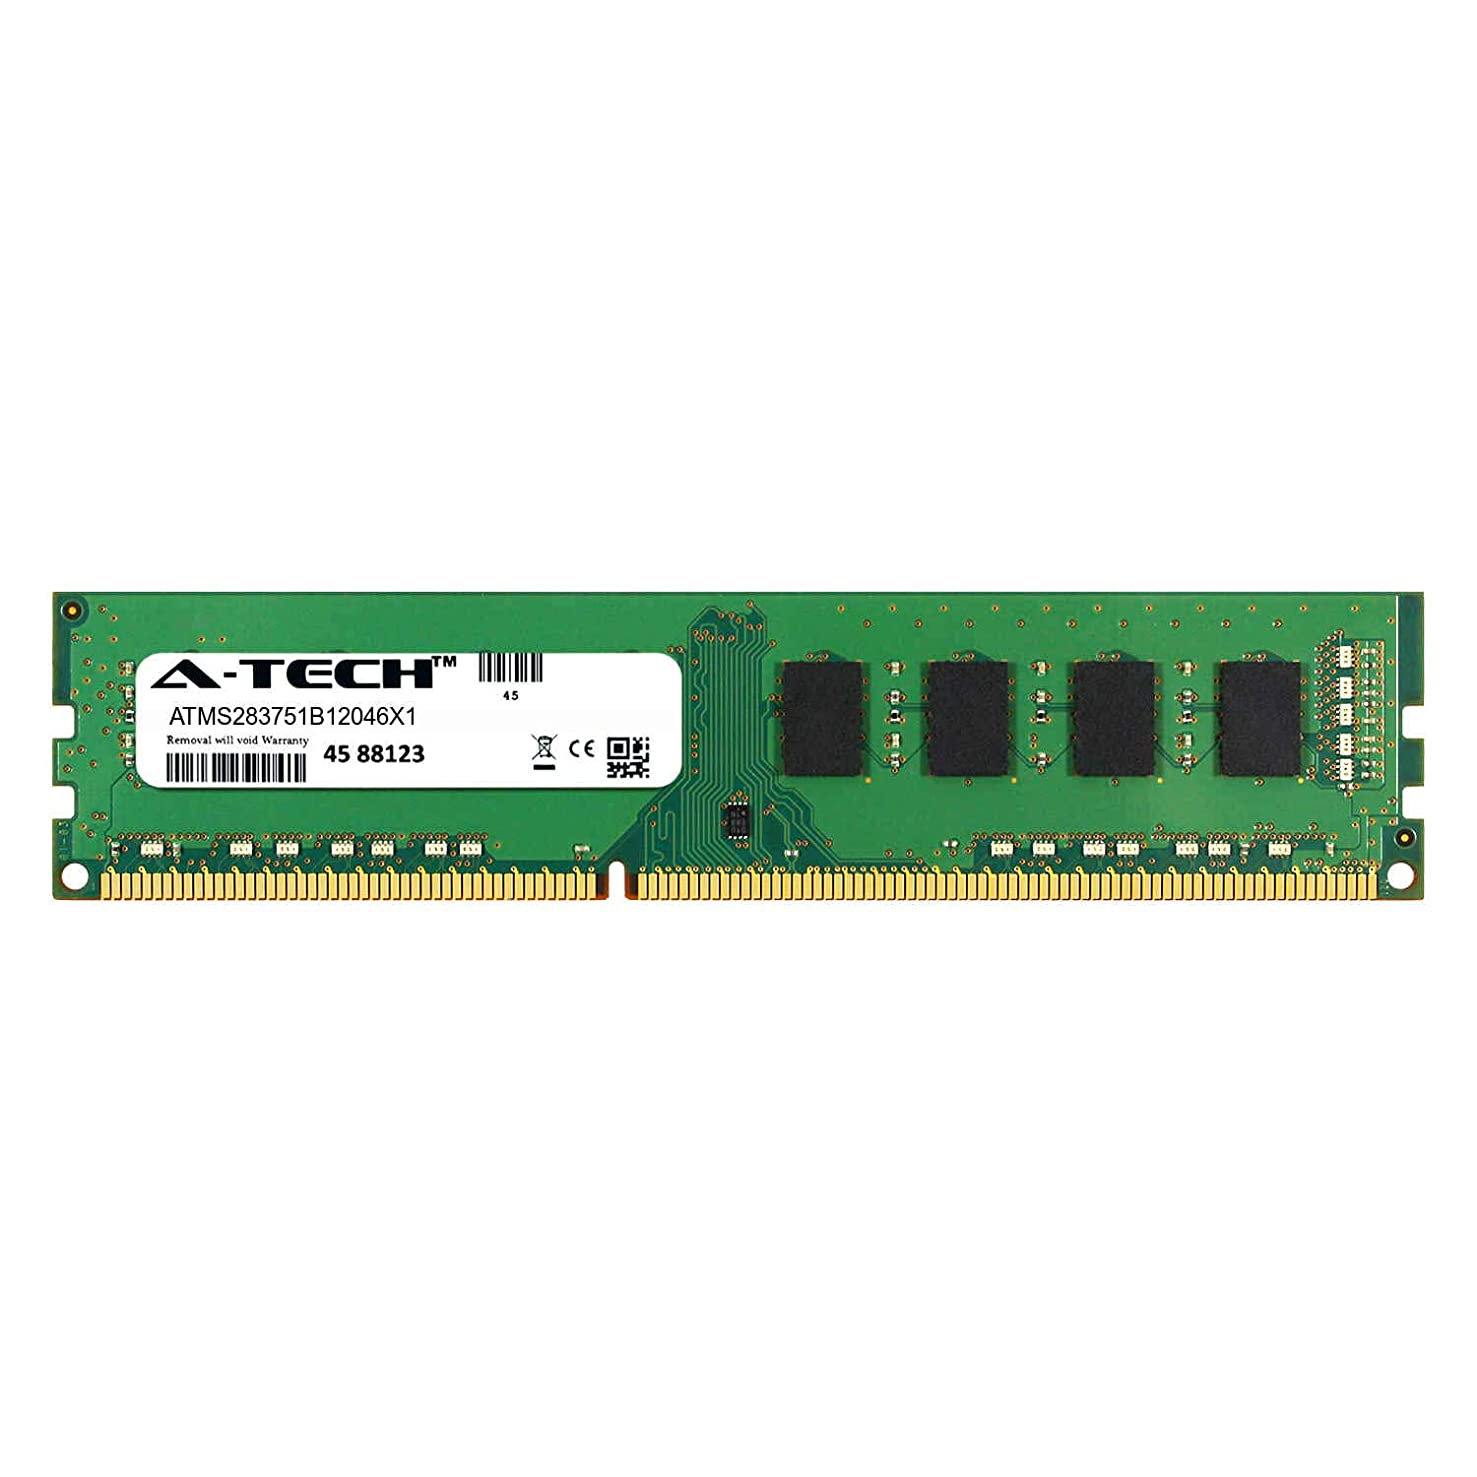 A-Tech 4GB Module for Dell OptiPlex 3010 Mini Tower Desktop & Workstation Motherboard Compatible DDR3/DDR3L PC3-12800 1600Mhz Memory Ram (ATMS283751B12046X1)